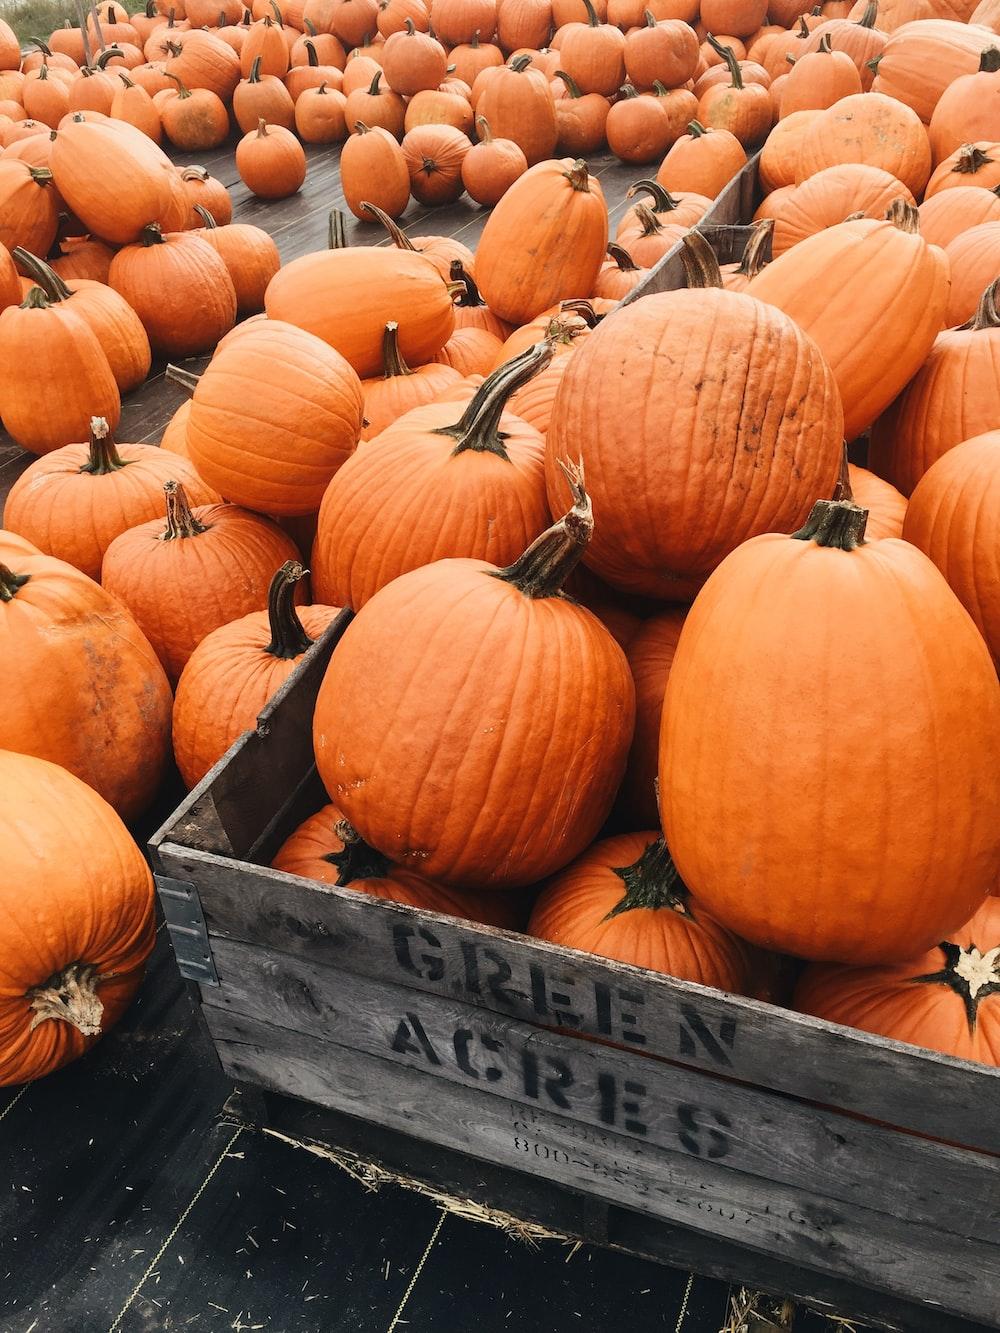 shallow focus photo of orange pumpkins